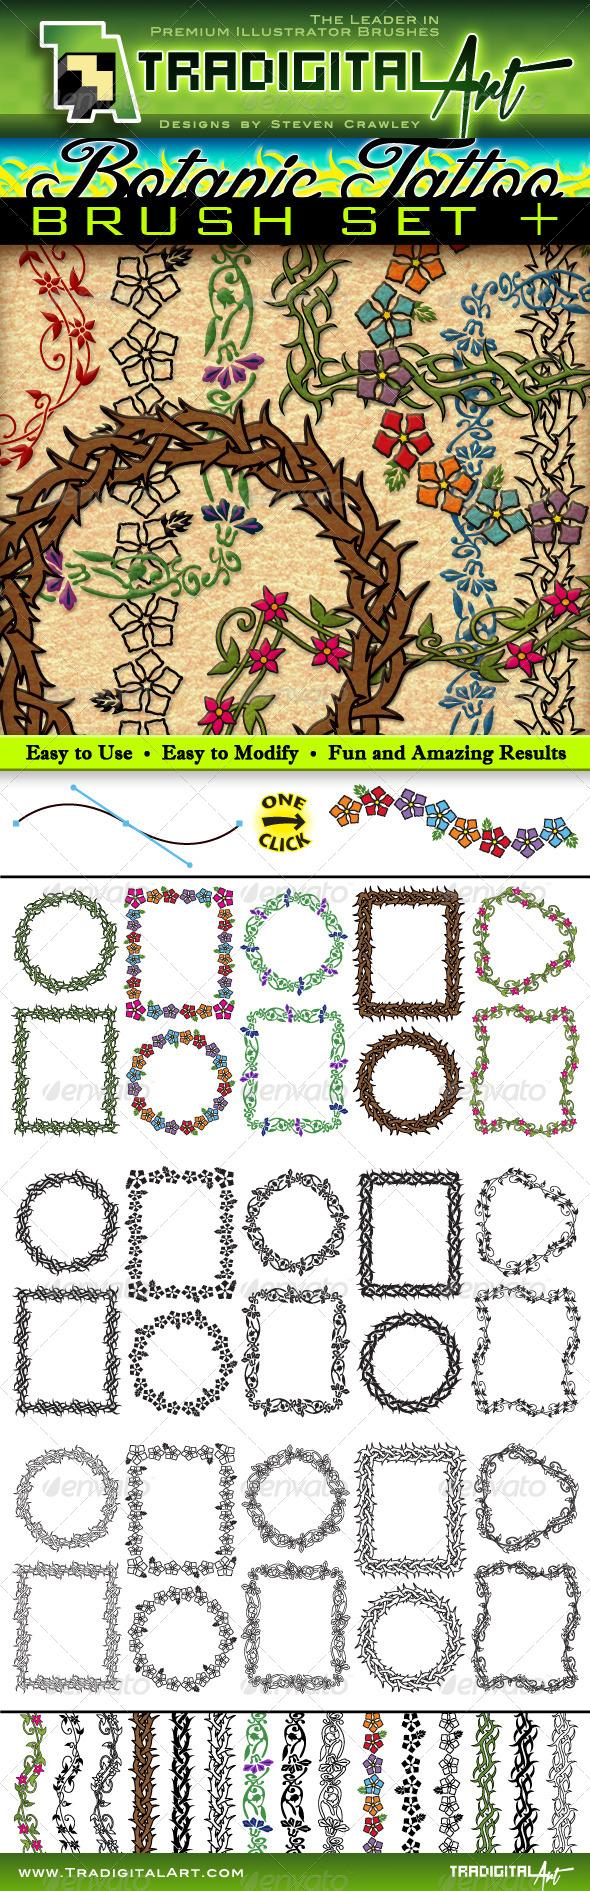 GraphicRiver Botanic Tattoo Brush Set & 7647977